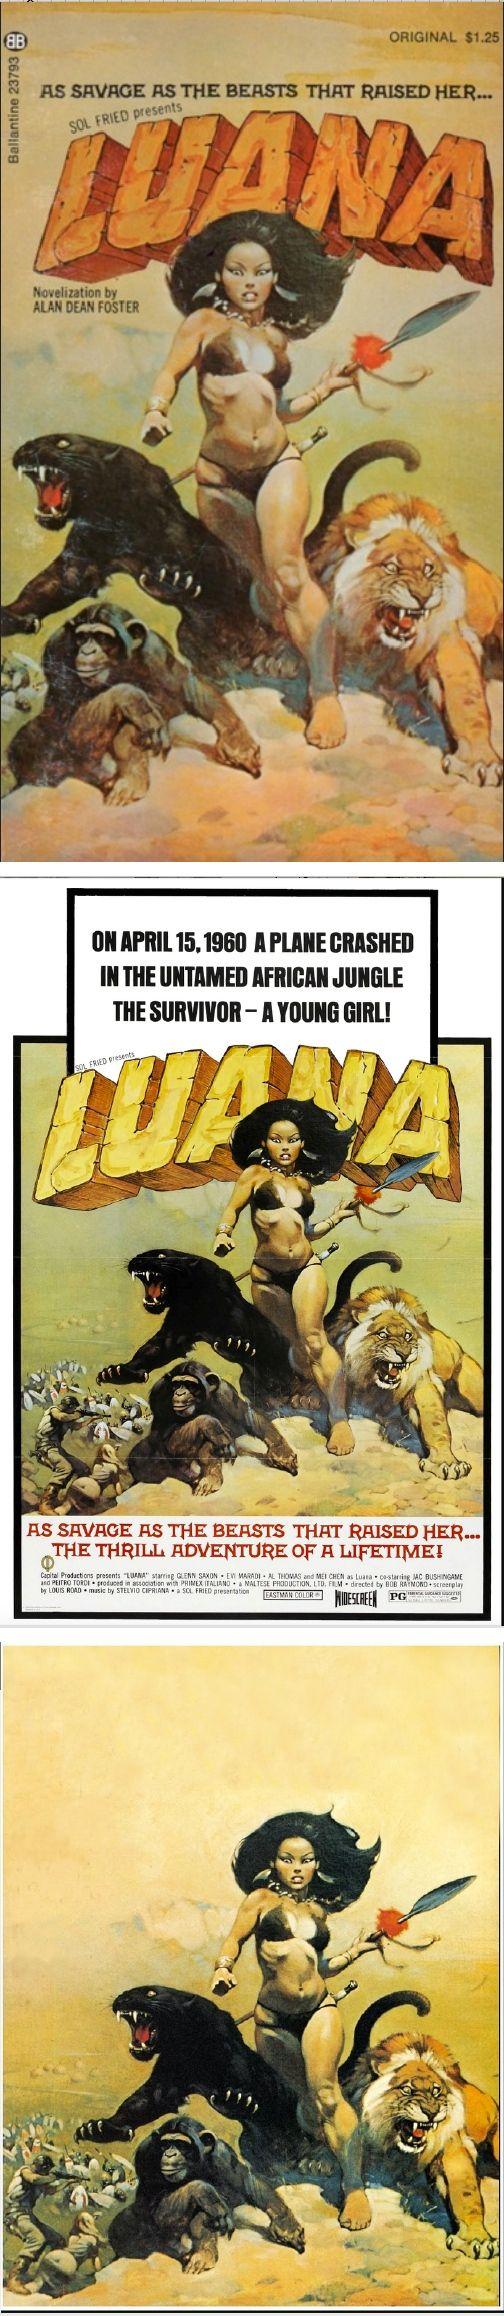 FRANK FRAZETTA - Luana by Alan Dean Foster - 1974 Ballantine Books - cover by isfdb - Luana, the Girl Tarzan - 1968 Italian/German film